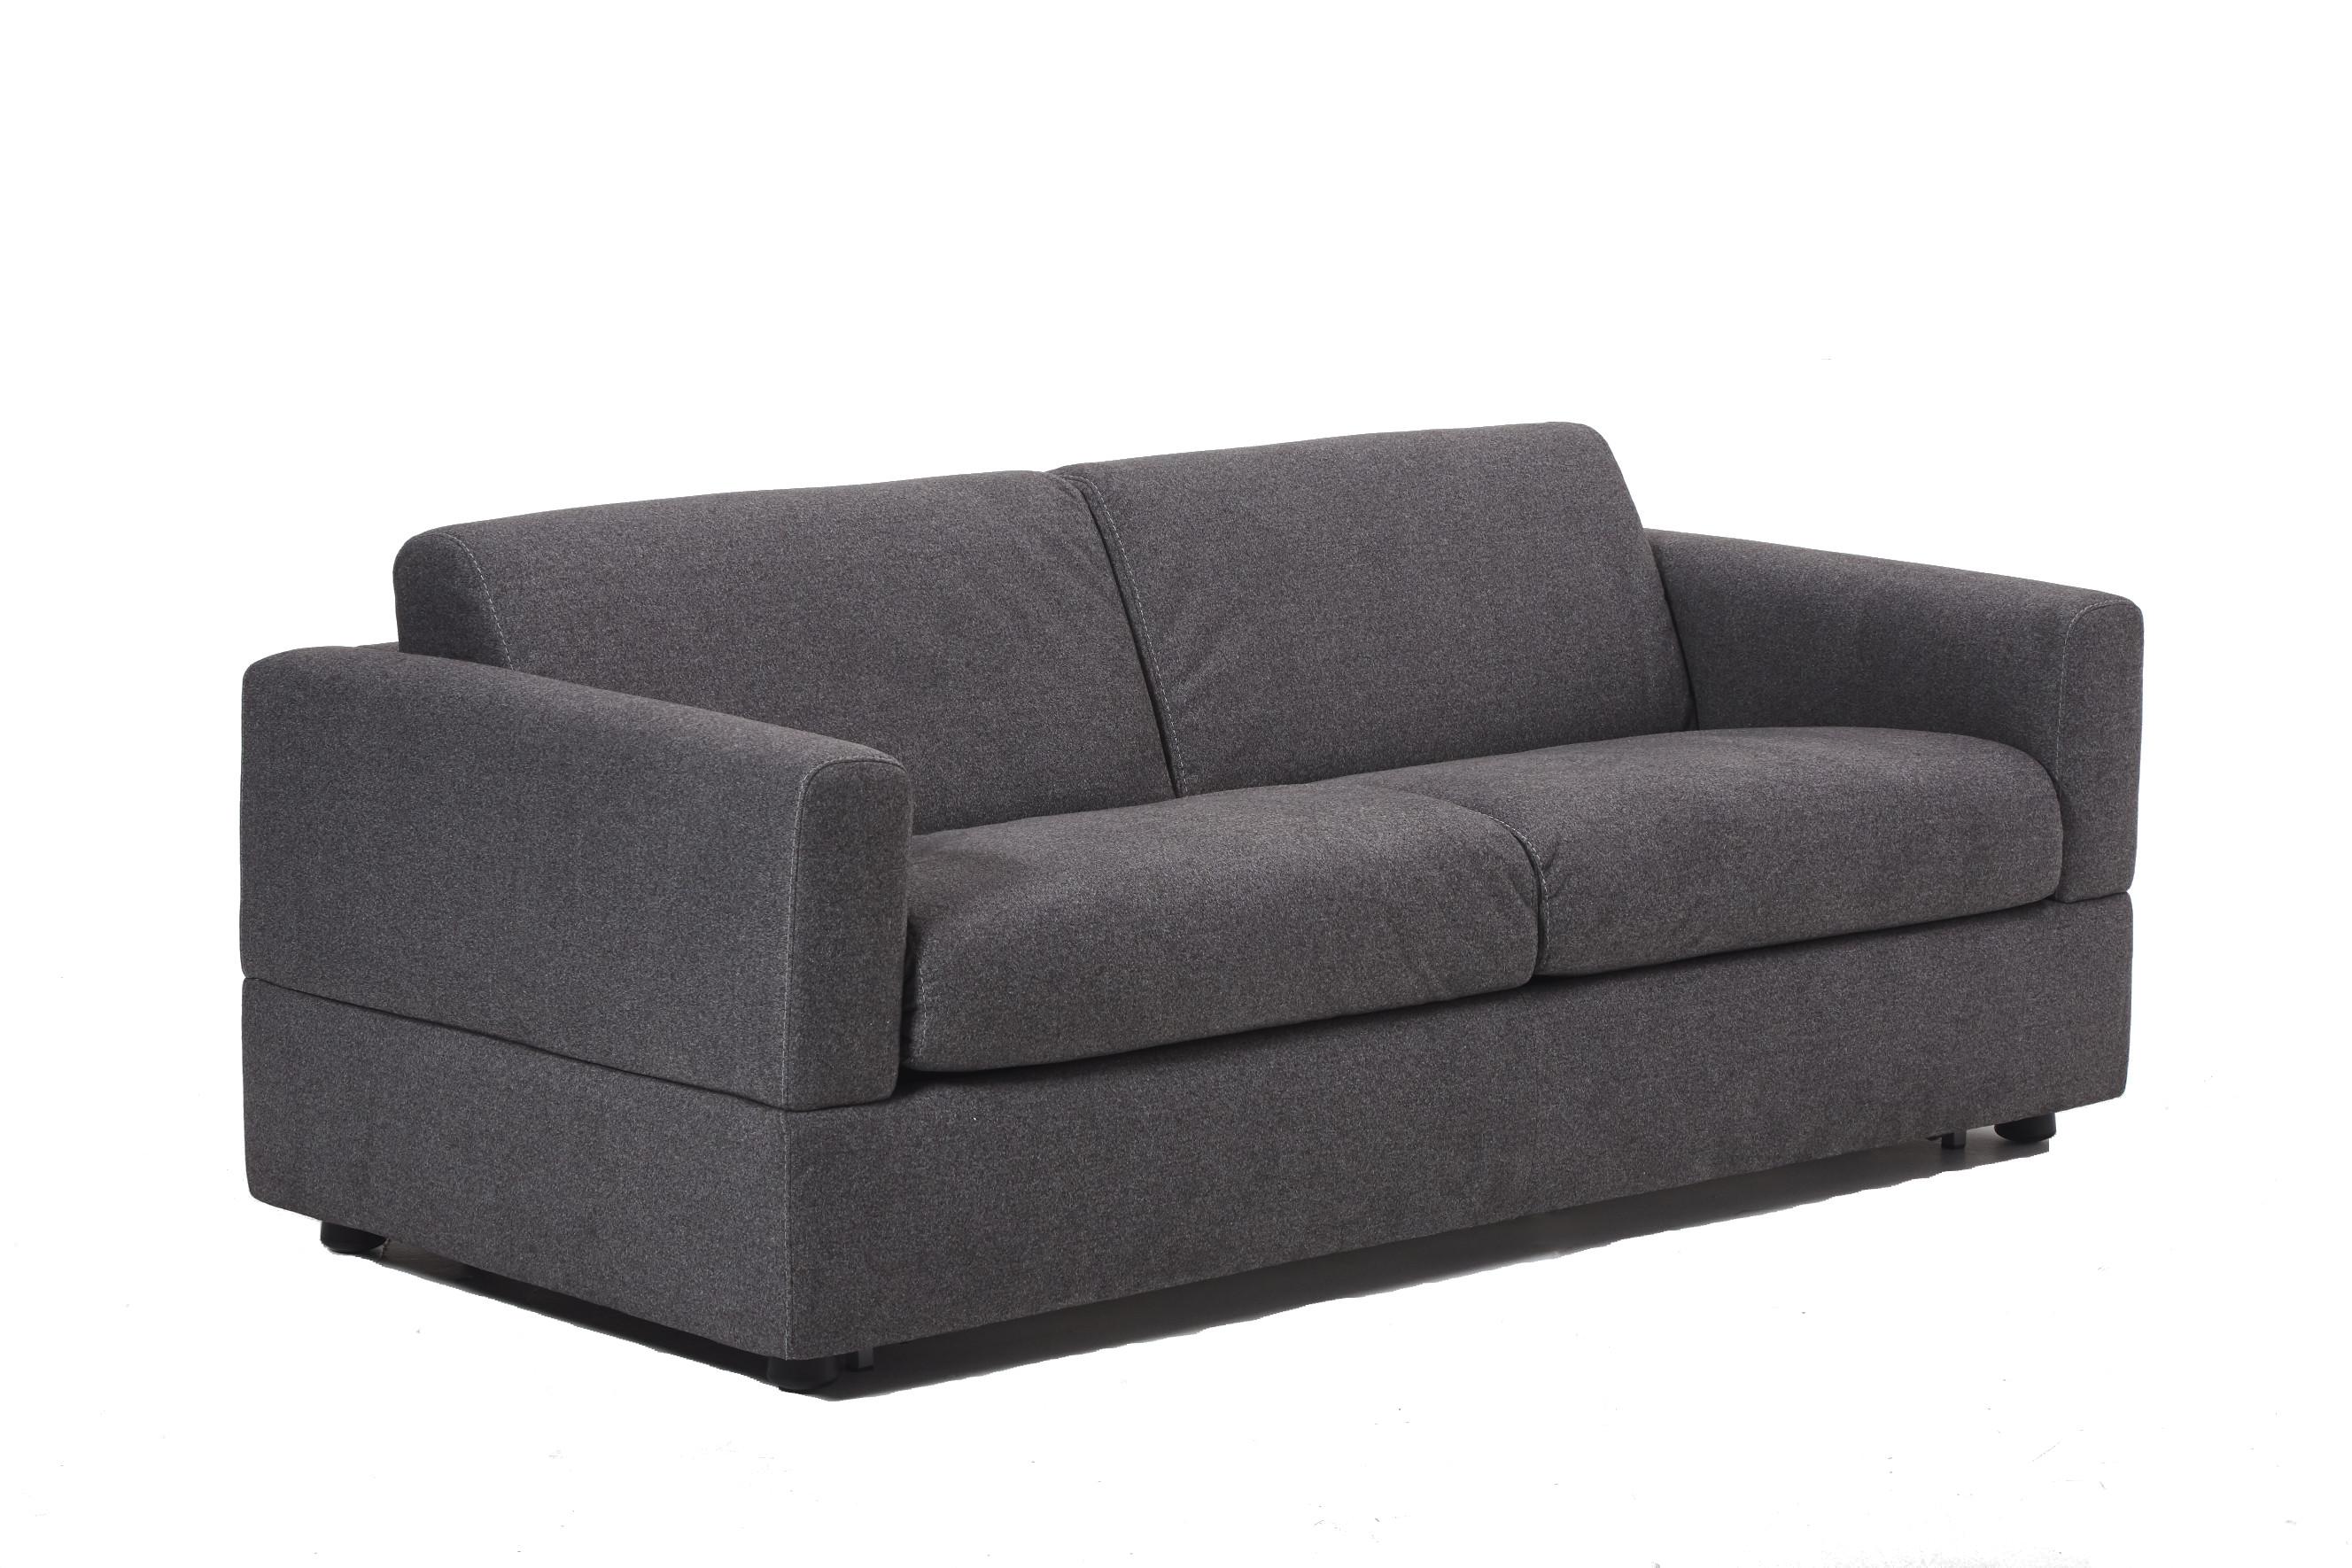 Visconti Sofa Bed Fabric - Grey